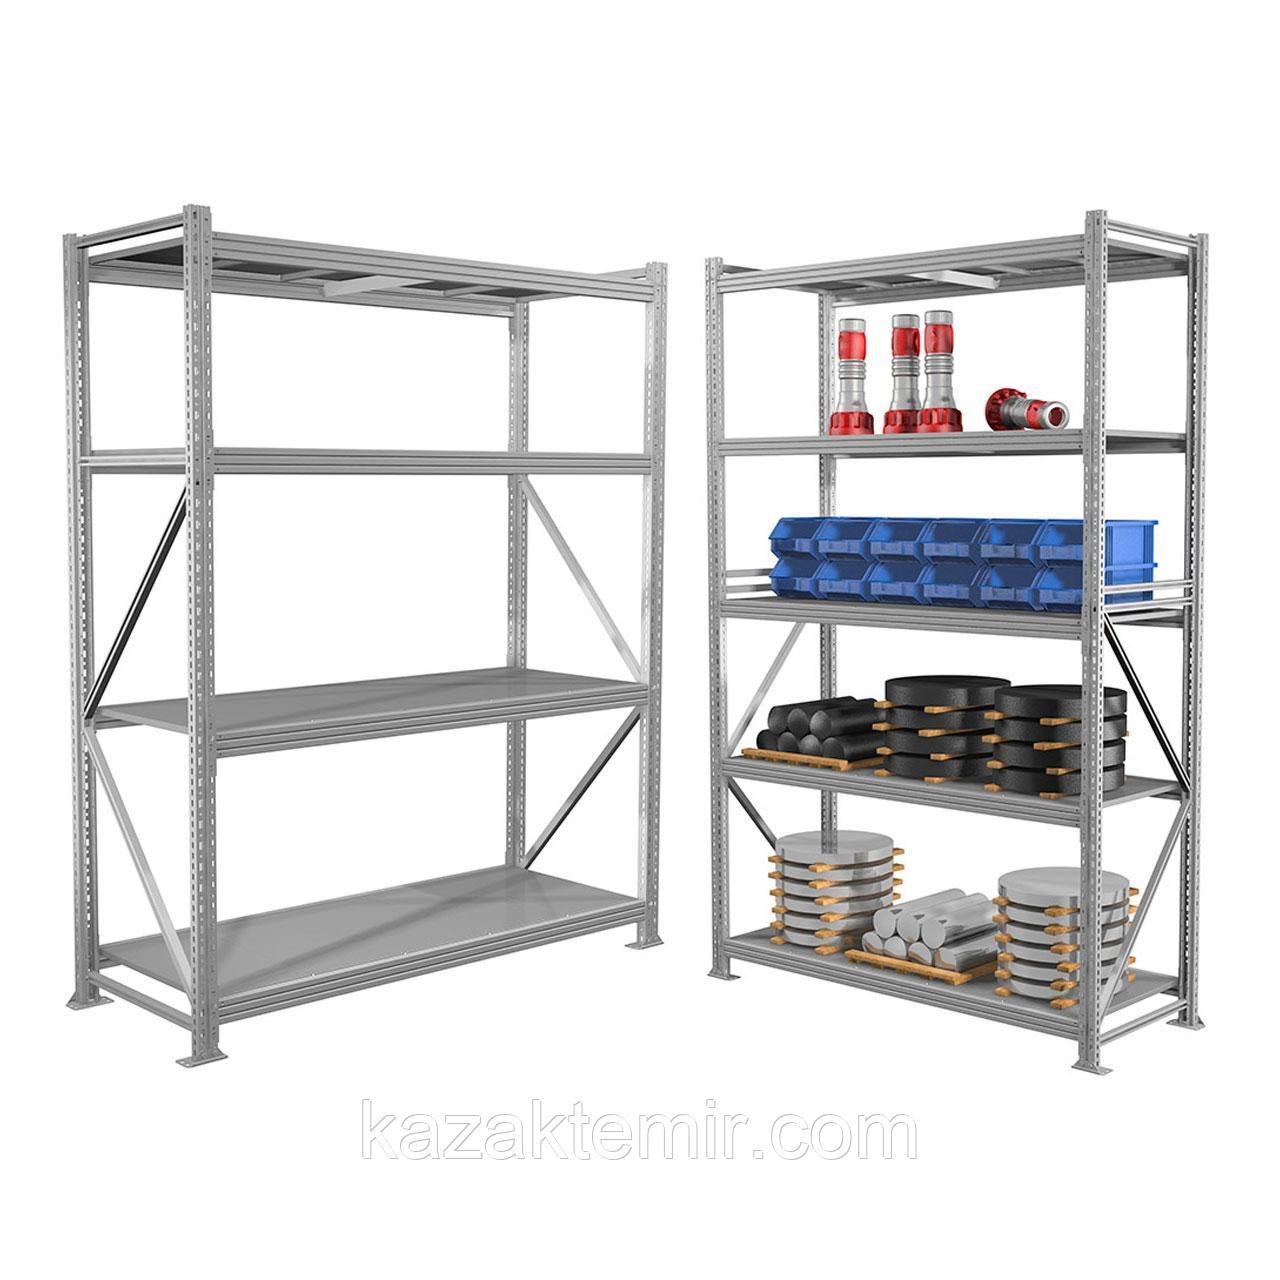 Металлические шкафы, стеллажи